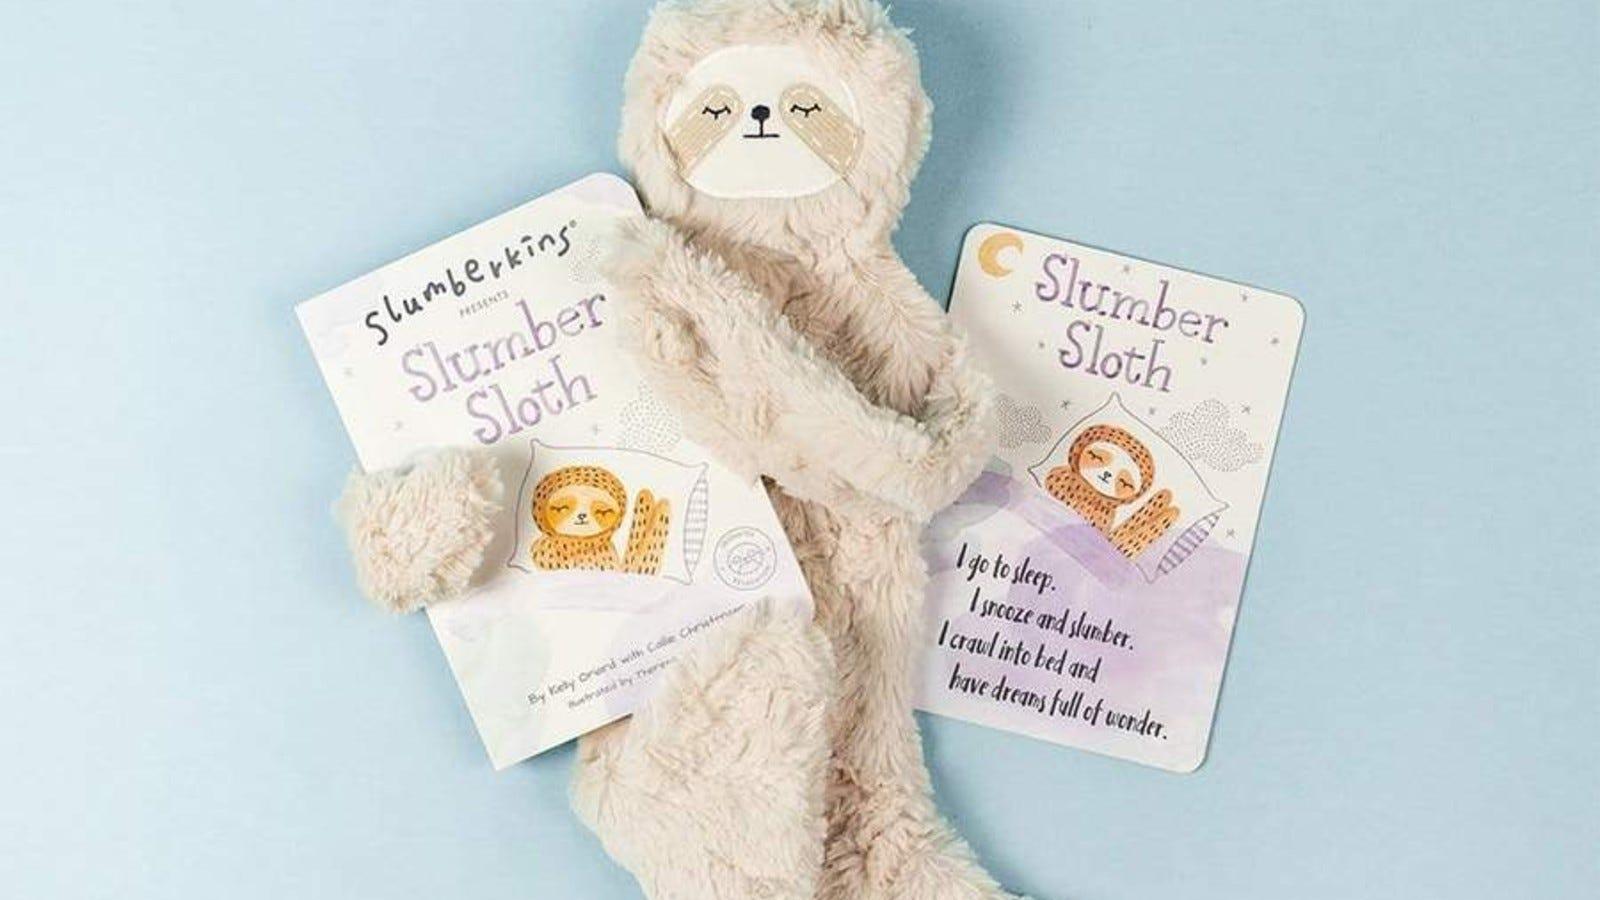 The Slumberkins Slumber Sloth and book.